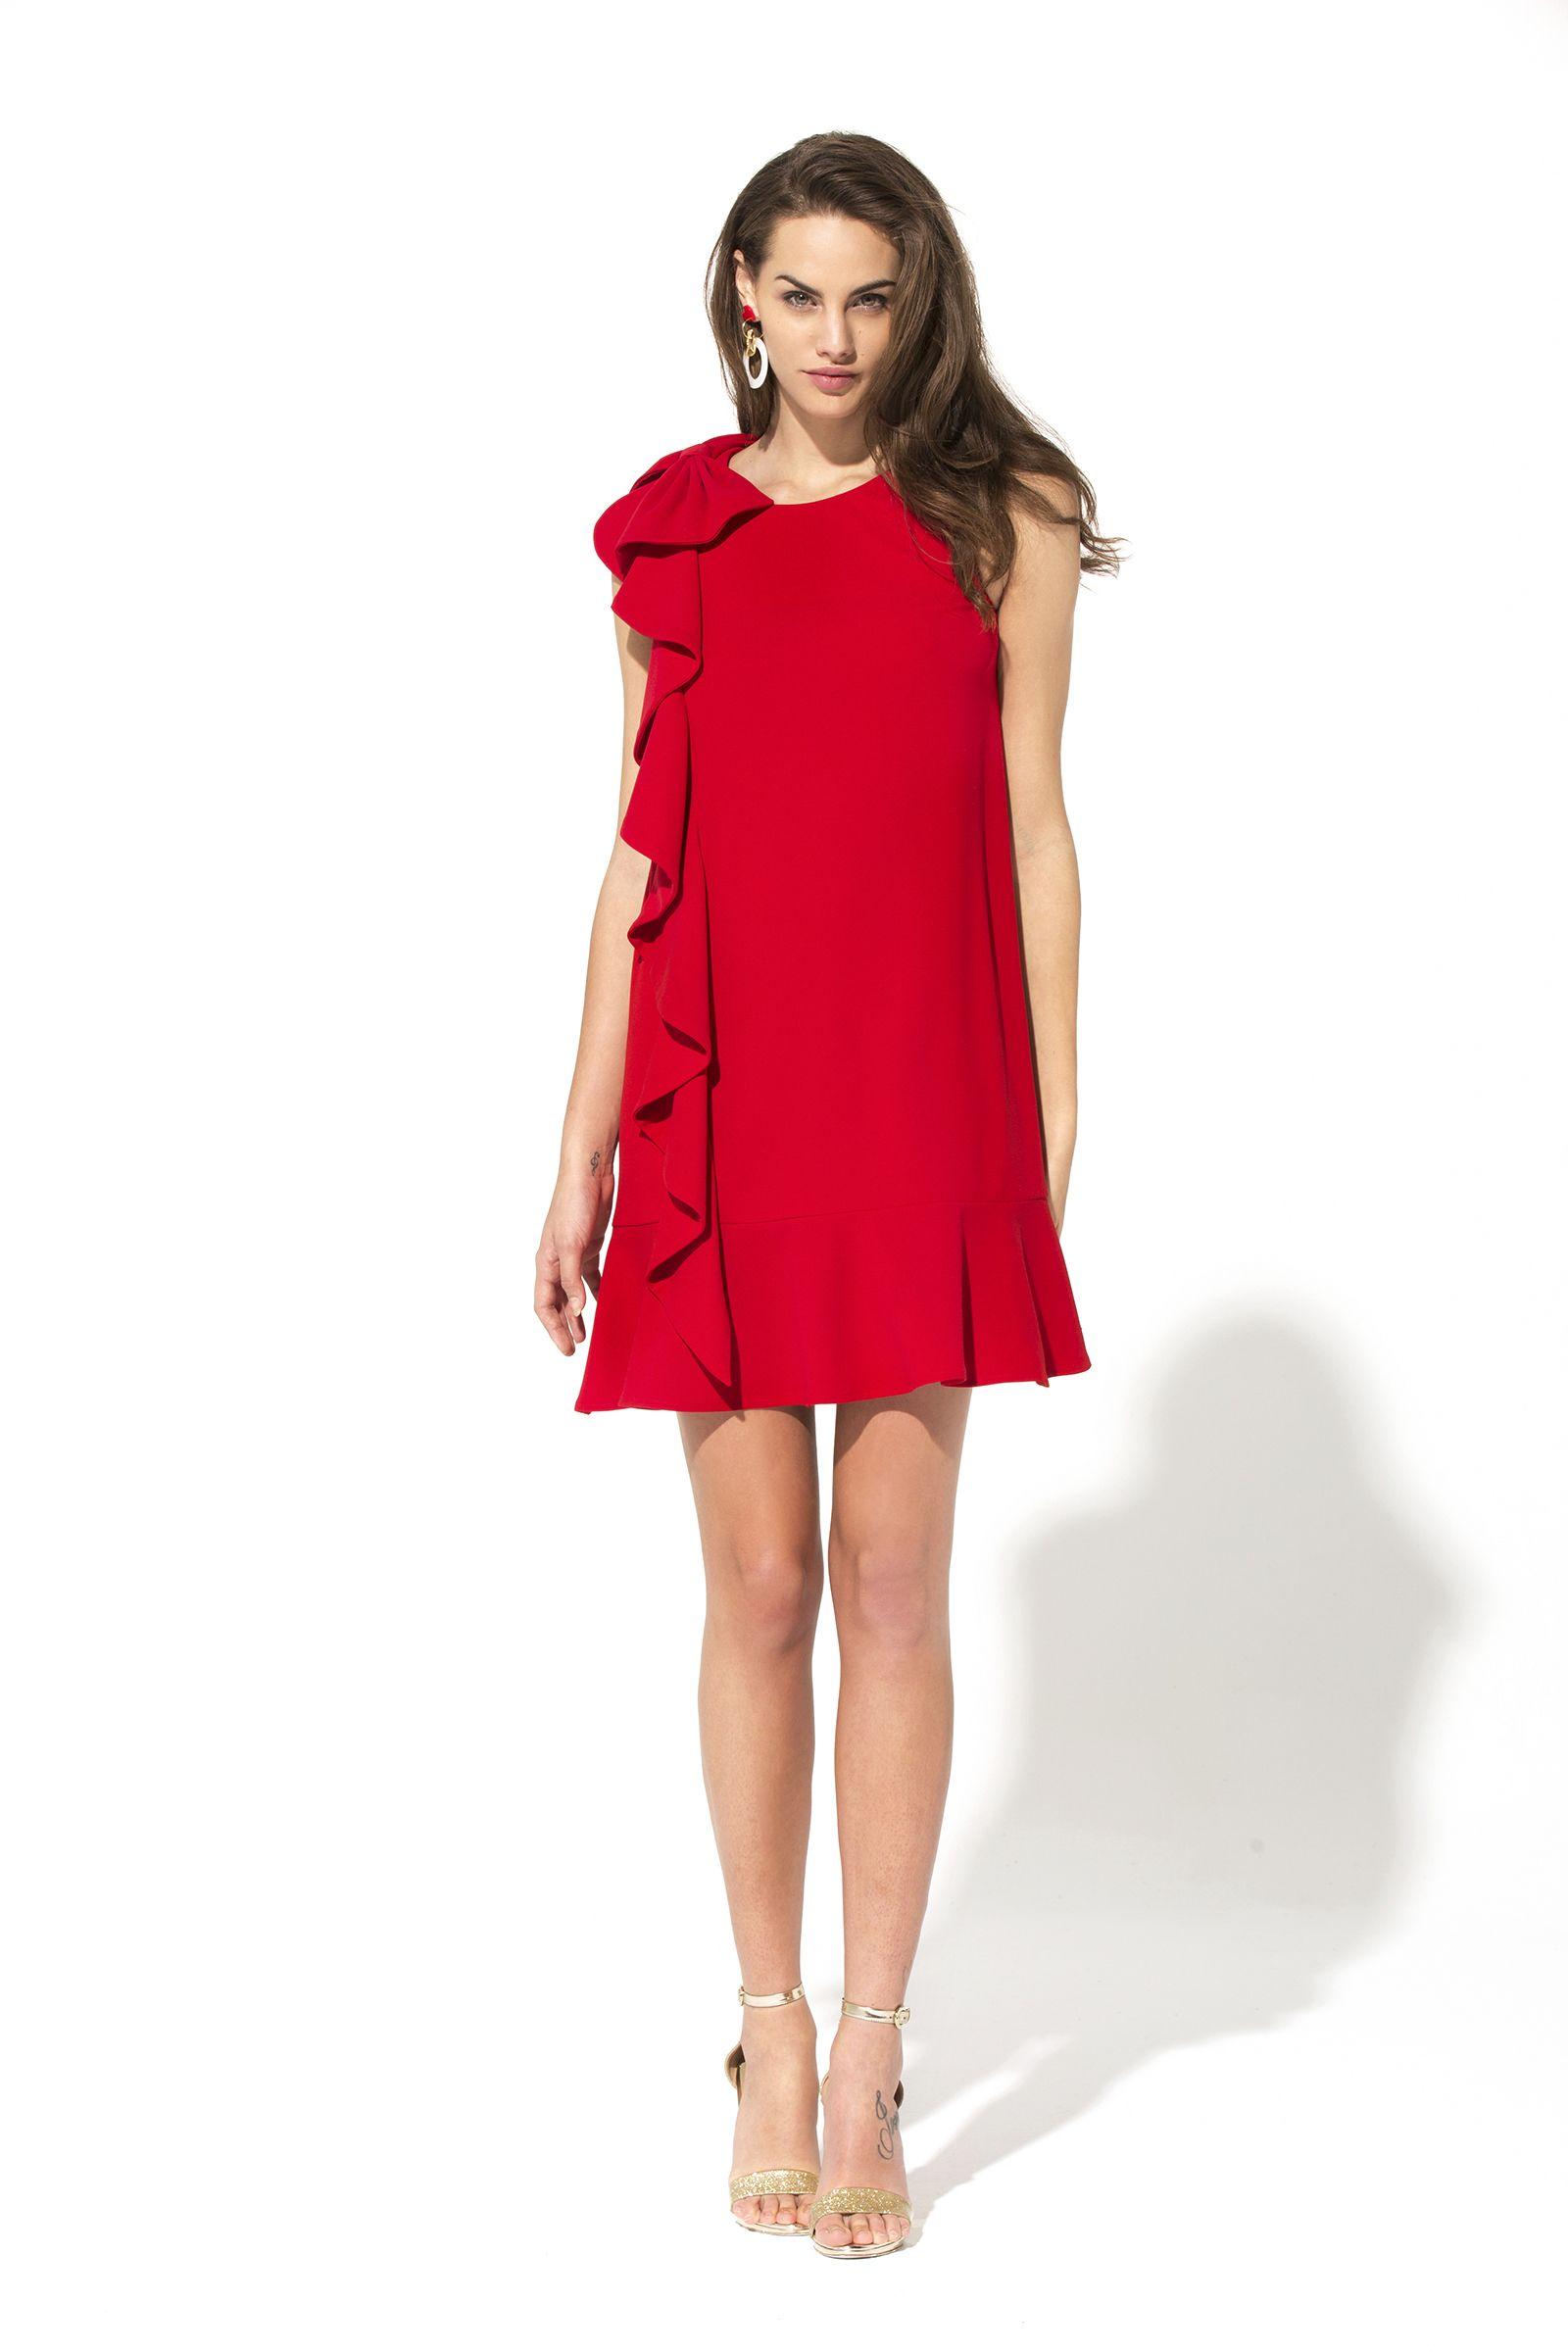 Vestido ma petite robe rouge   MIS FAVORITOS   Pinterest   Petite ... c6a2966215c3